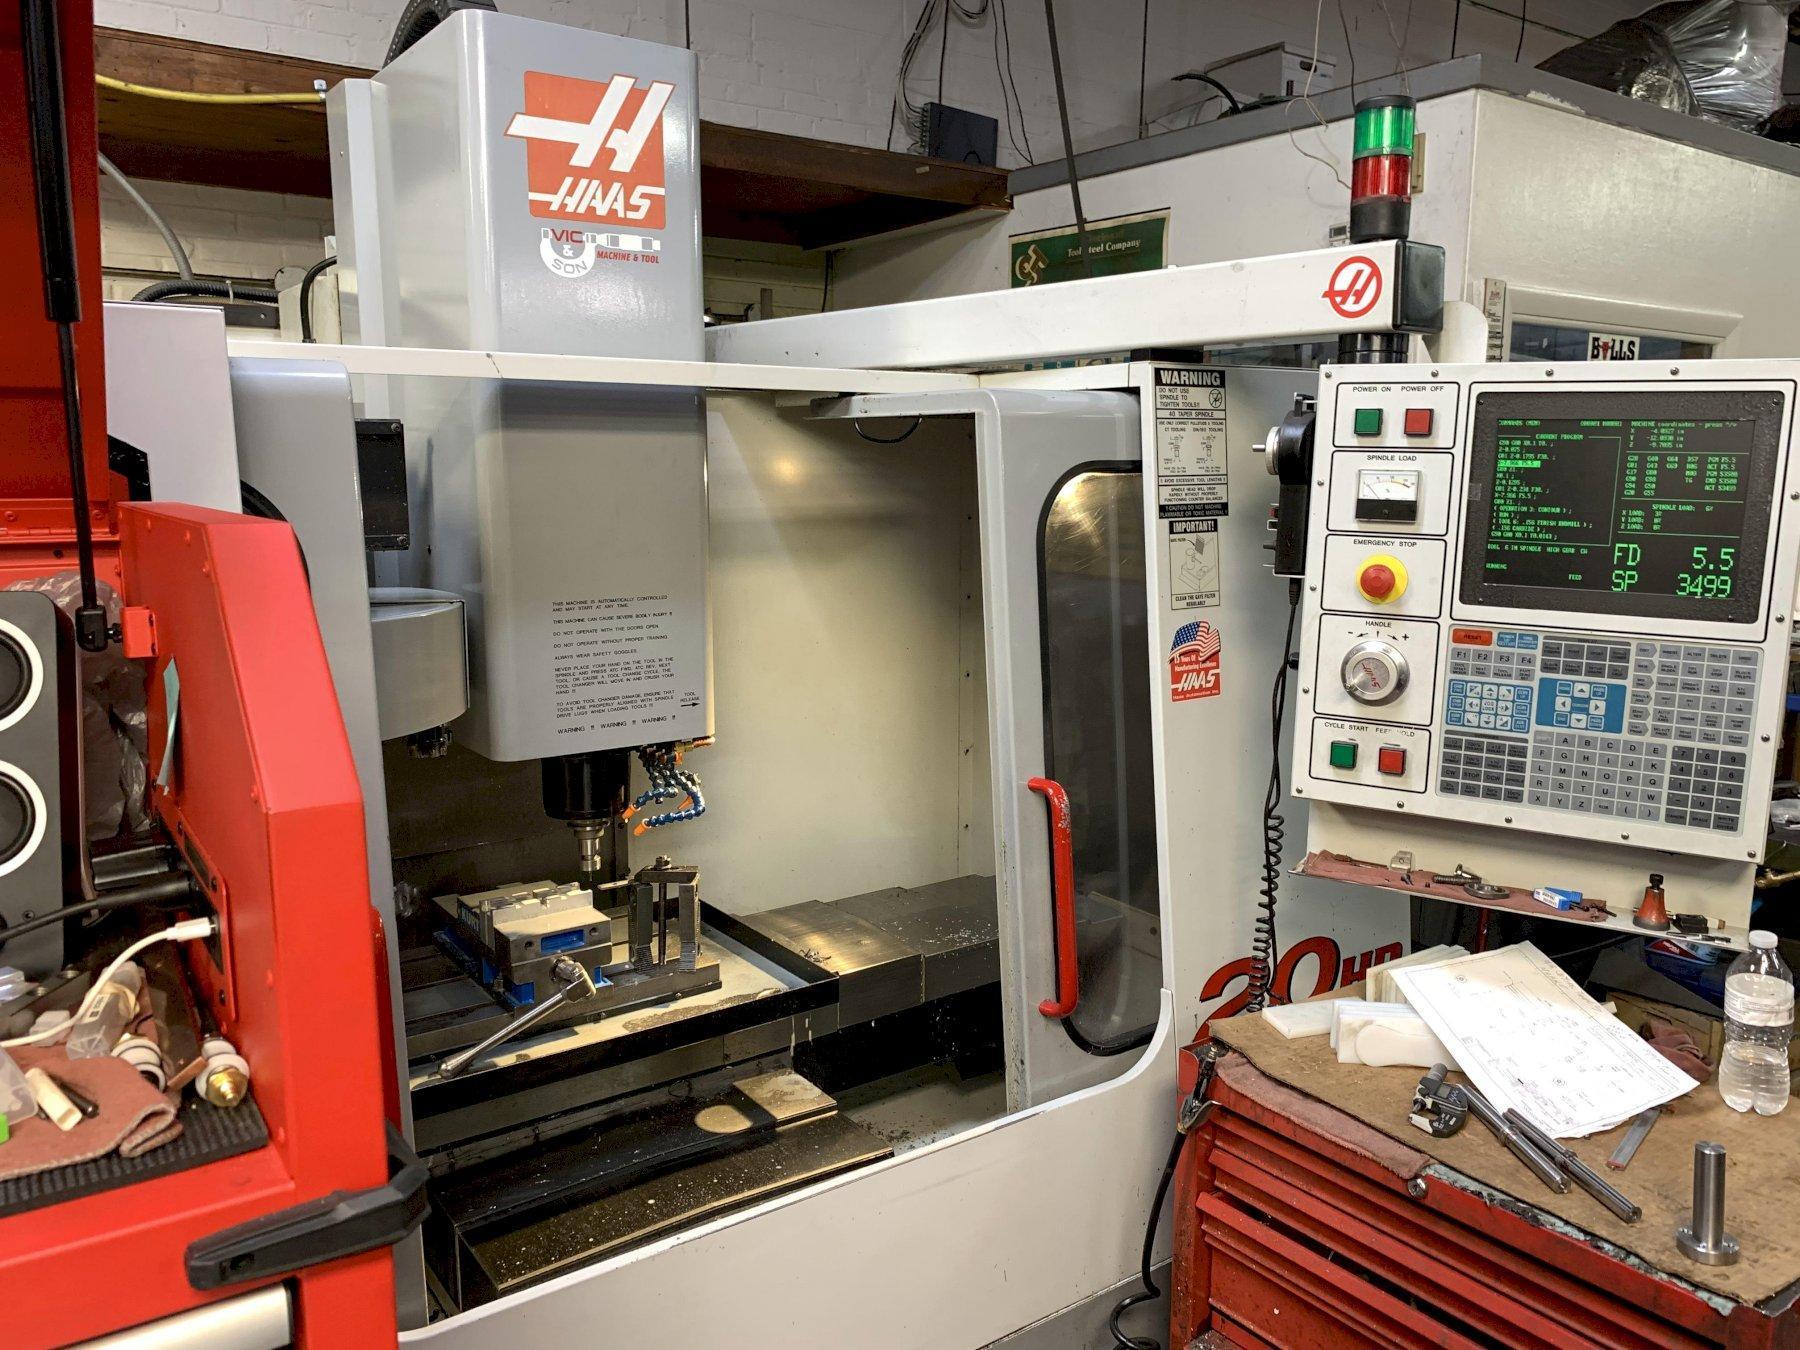 Haas VF-2/40 3-Axis CNC Vertical Machining Center